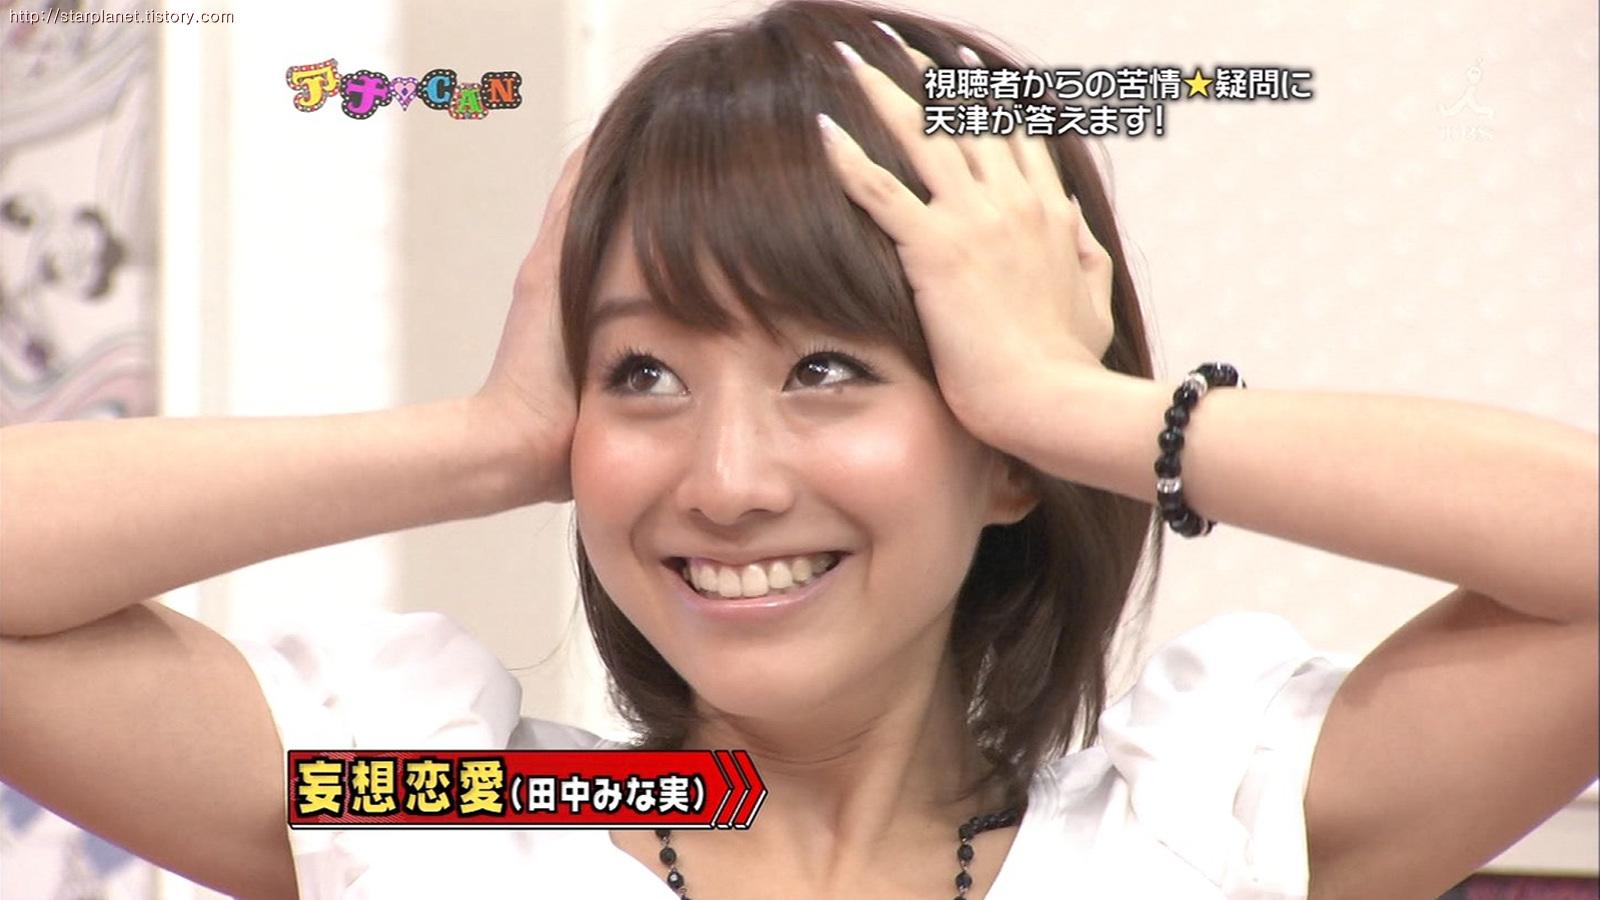 Tanaka Minami 다양한 프로그램 속 일본여자 아나운서 다나카 미나미(Tanaka Minami) 모습을 만나보세요.